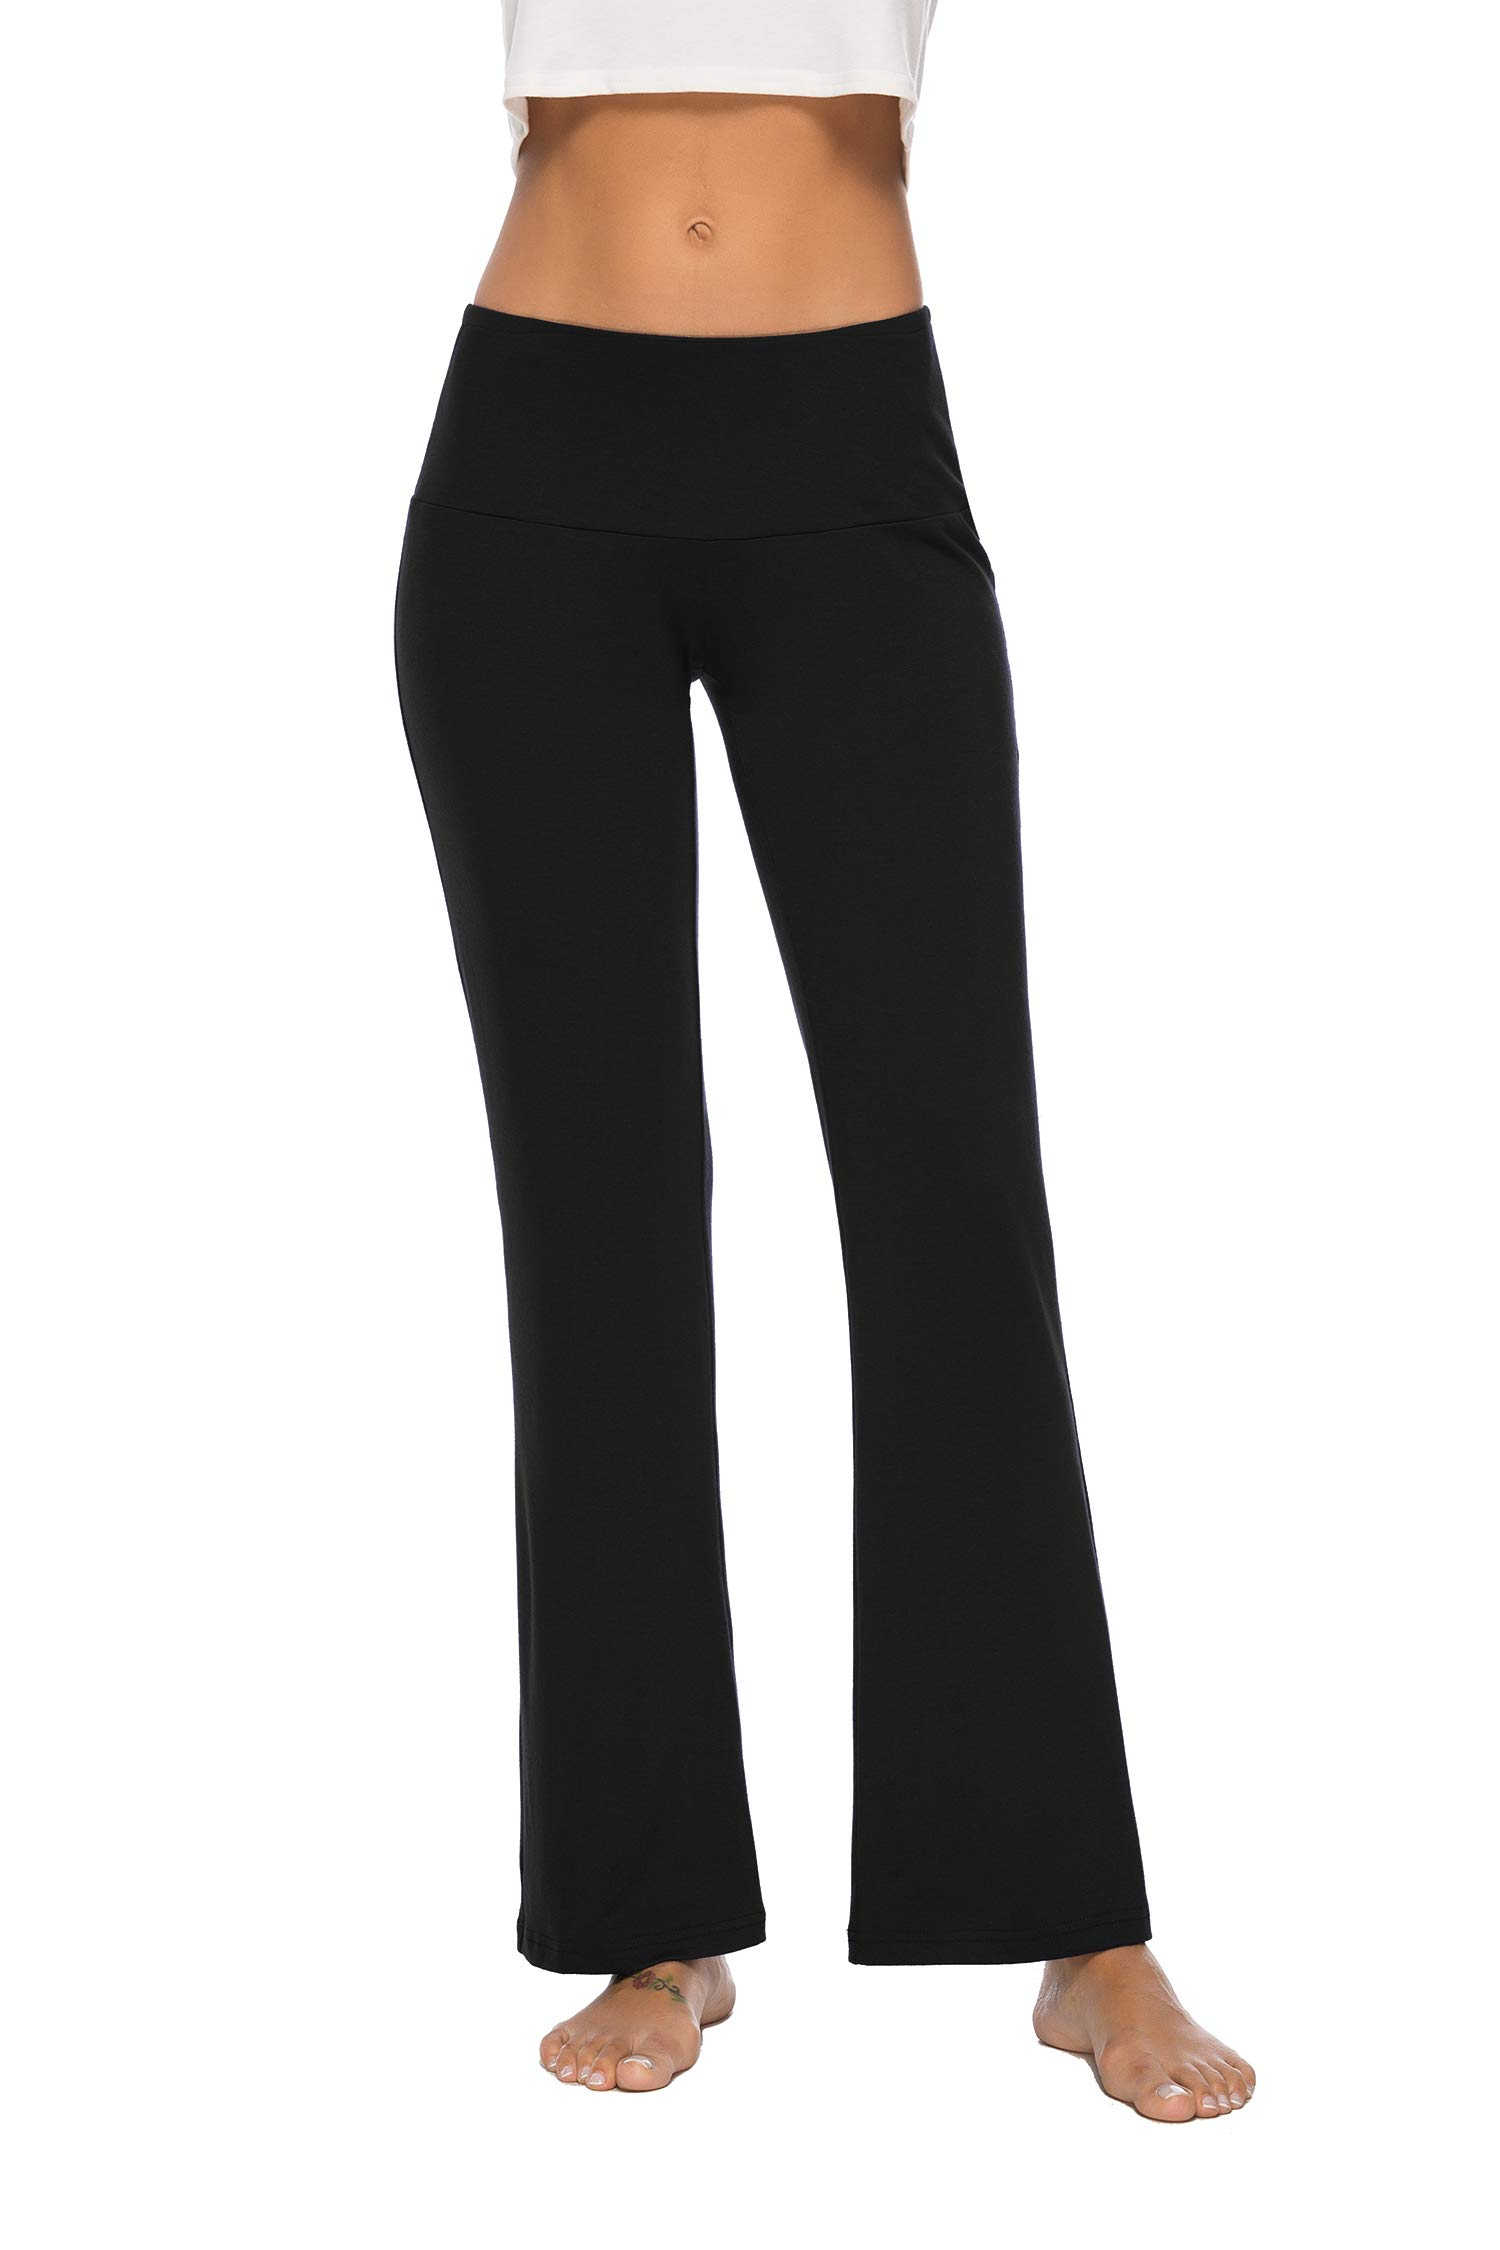 DIBAOLONG Womens Yoga Pants High Waist Bootcut Tummy Control Bootleg Power Flex Workout Leggings, Non See-Through